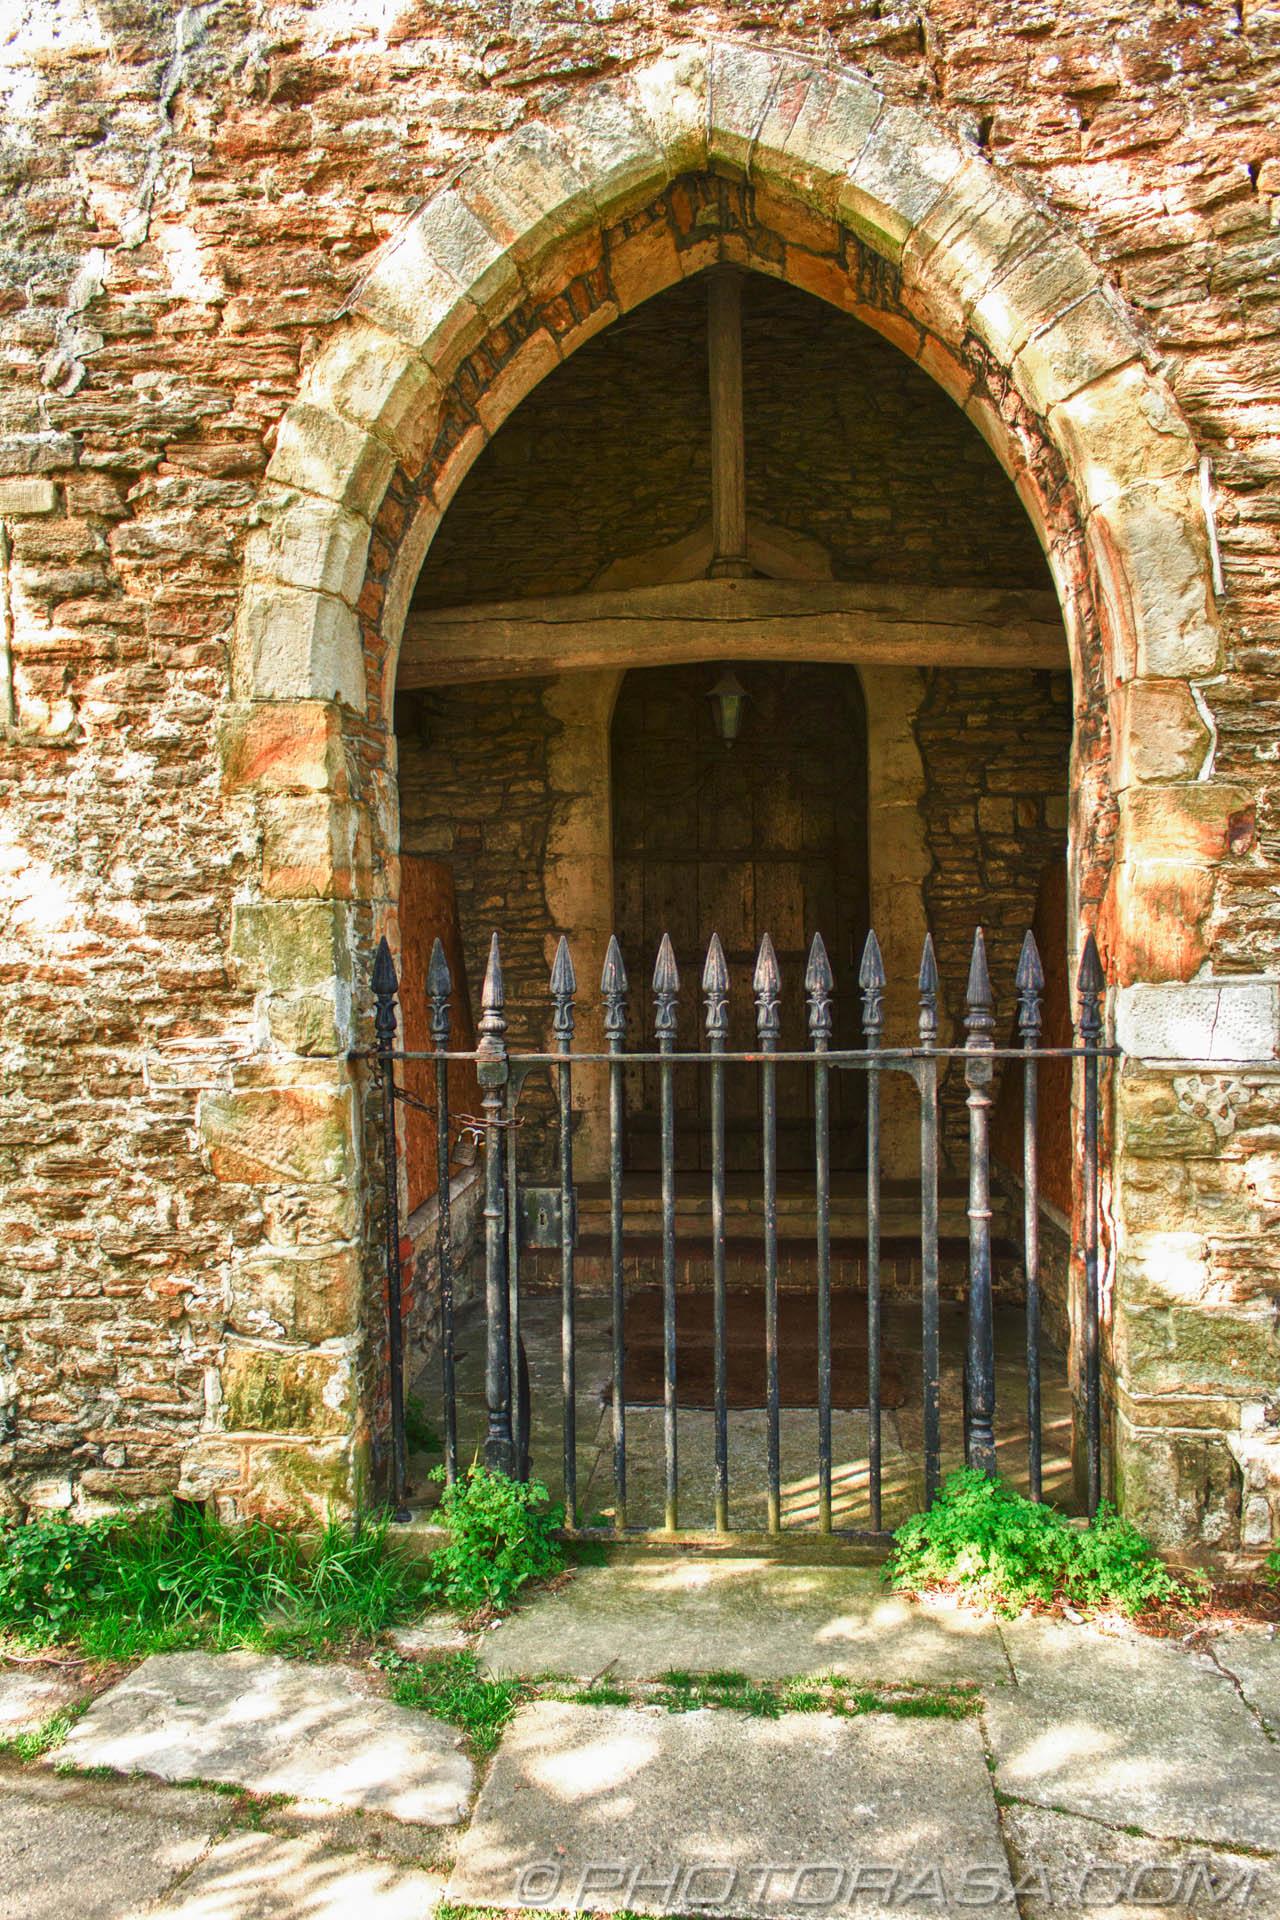 https://photorasa.com/saints-church-staplehurst-kent/blocked-norman-arch/